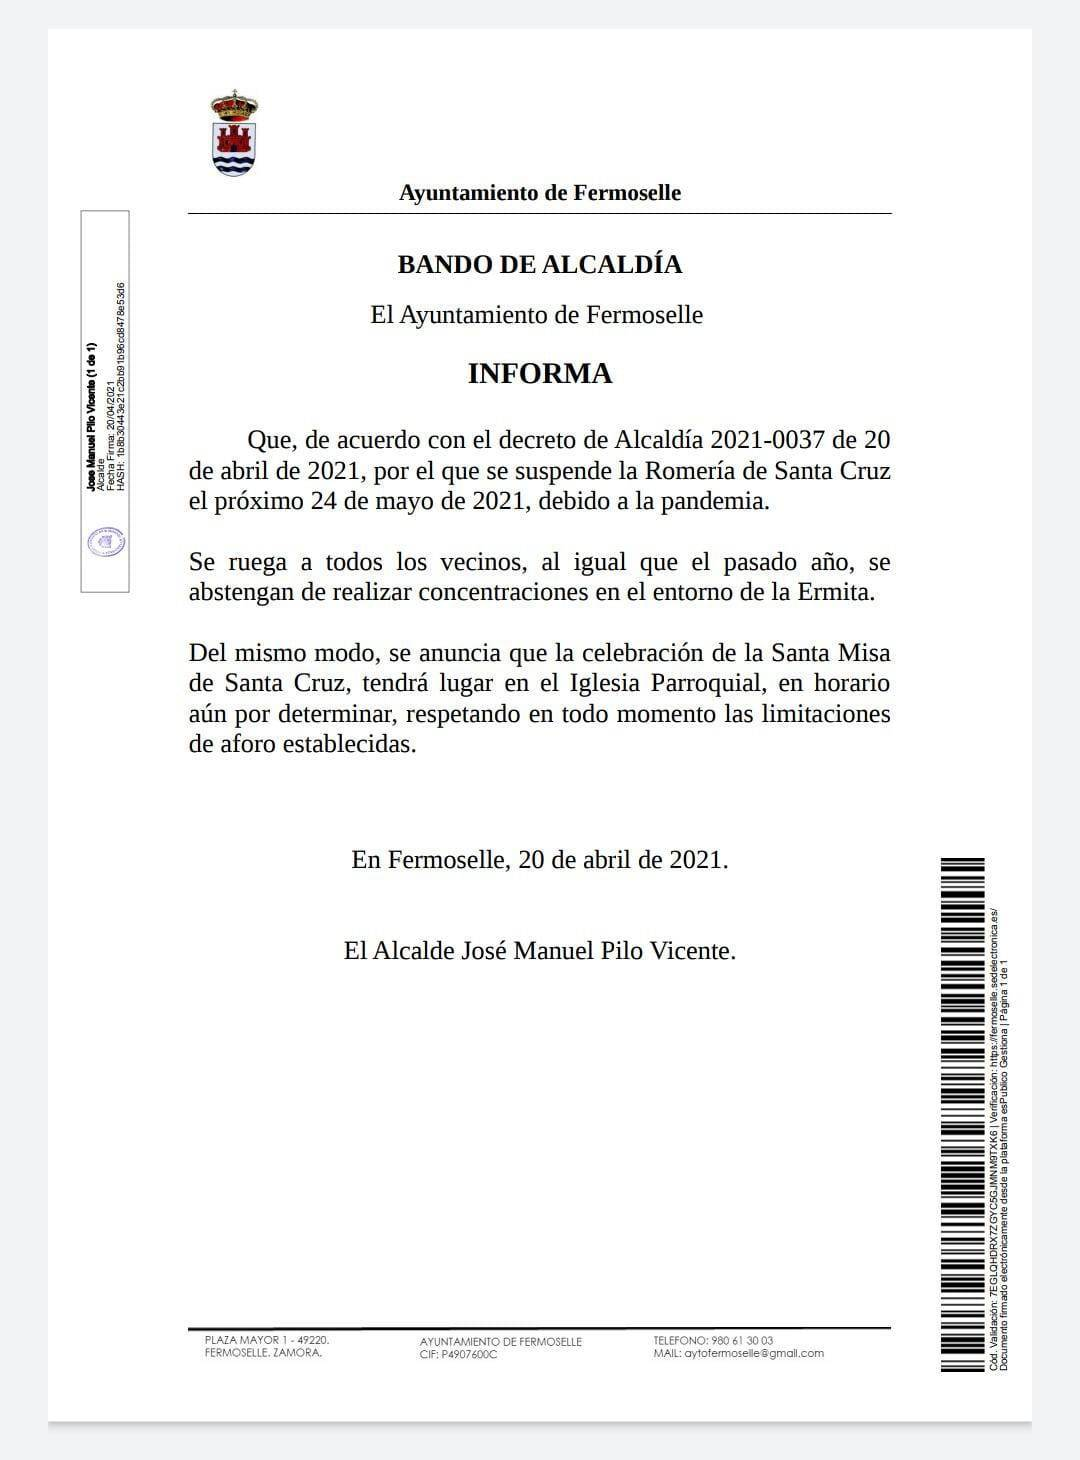 Se suspende la romería de Santa Cruz (2021) - Fermoselle (Zamora)